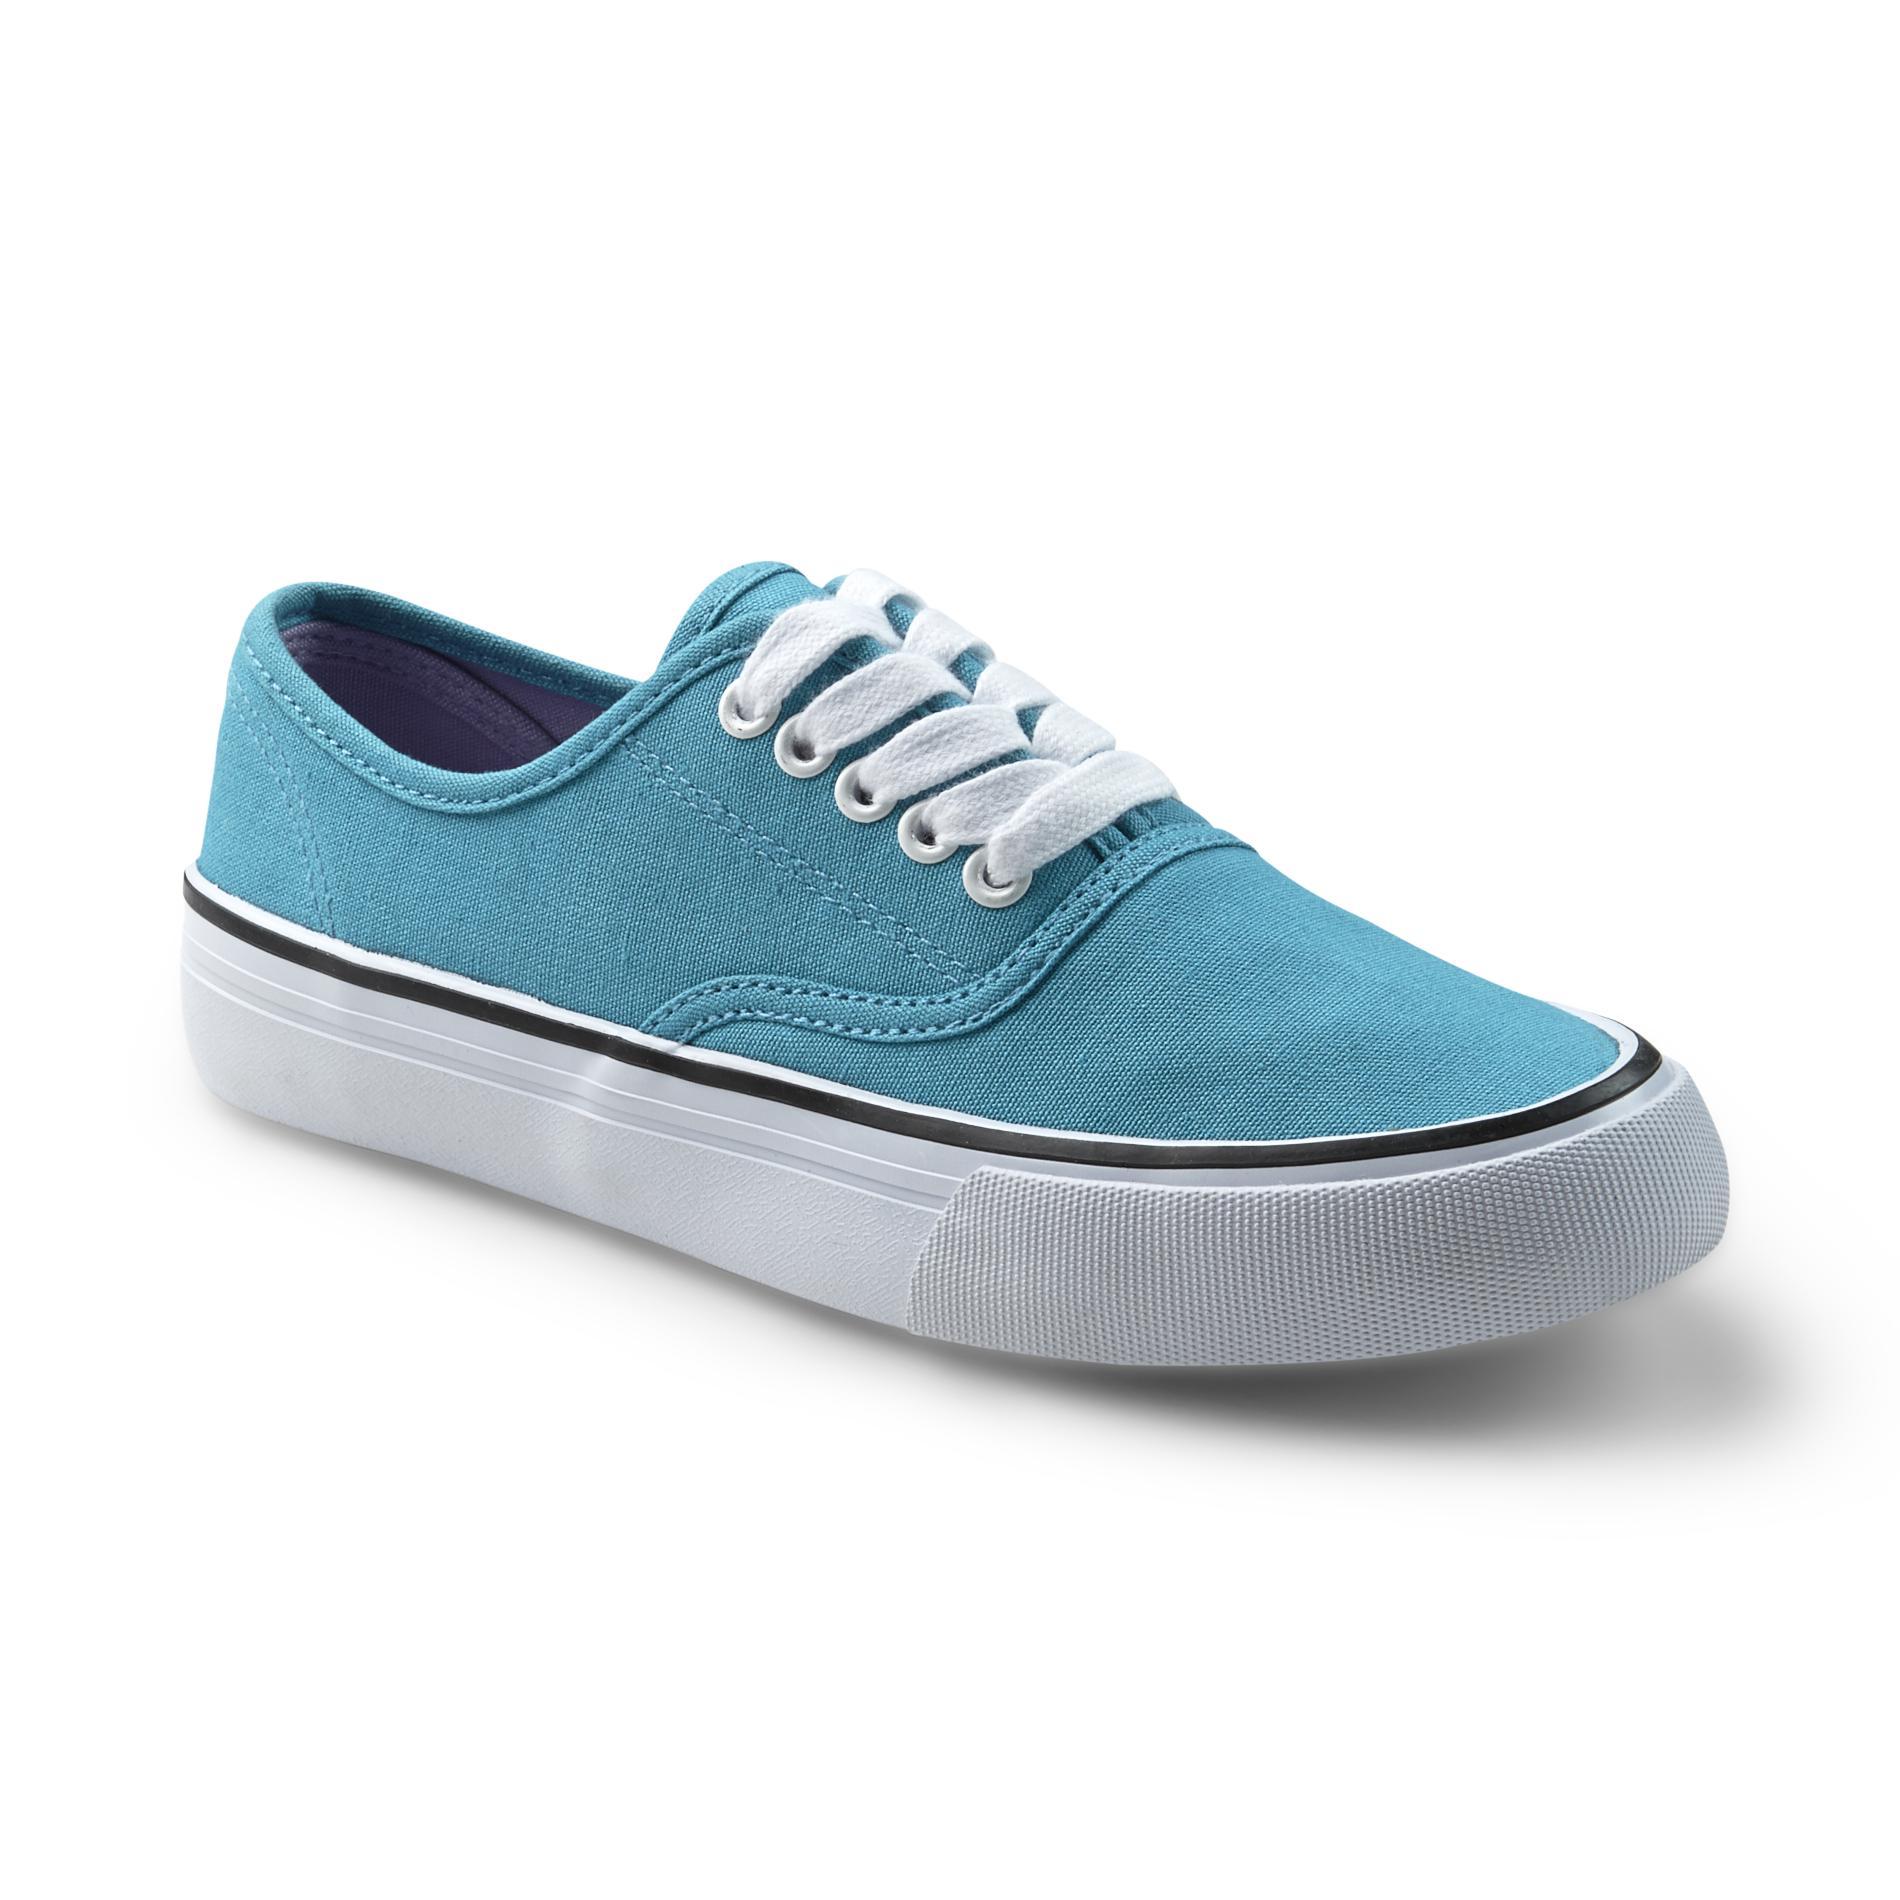 Bongo Women' Sonoma Turquoise Canvas Shoe - Shoes Flats